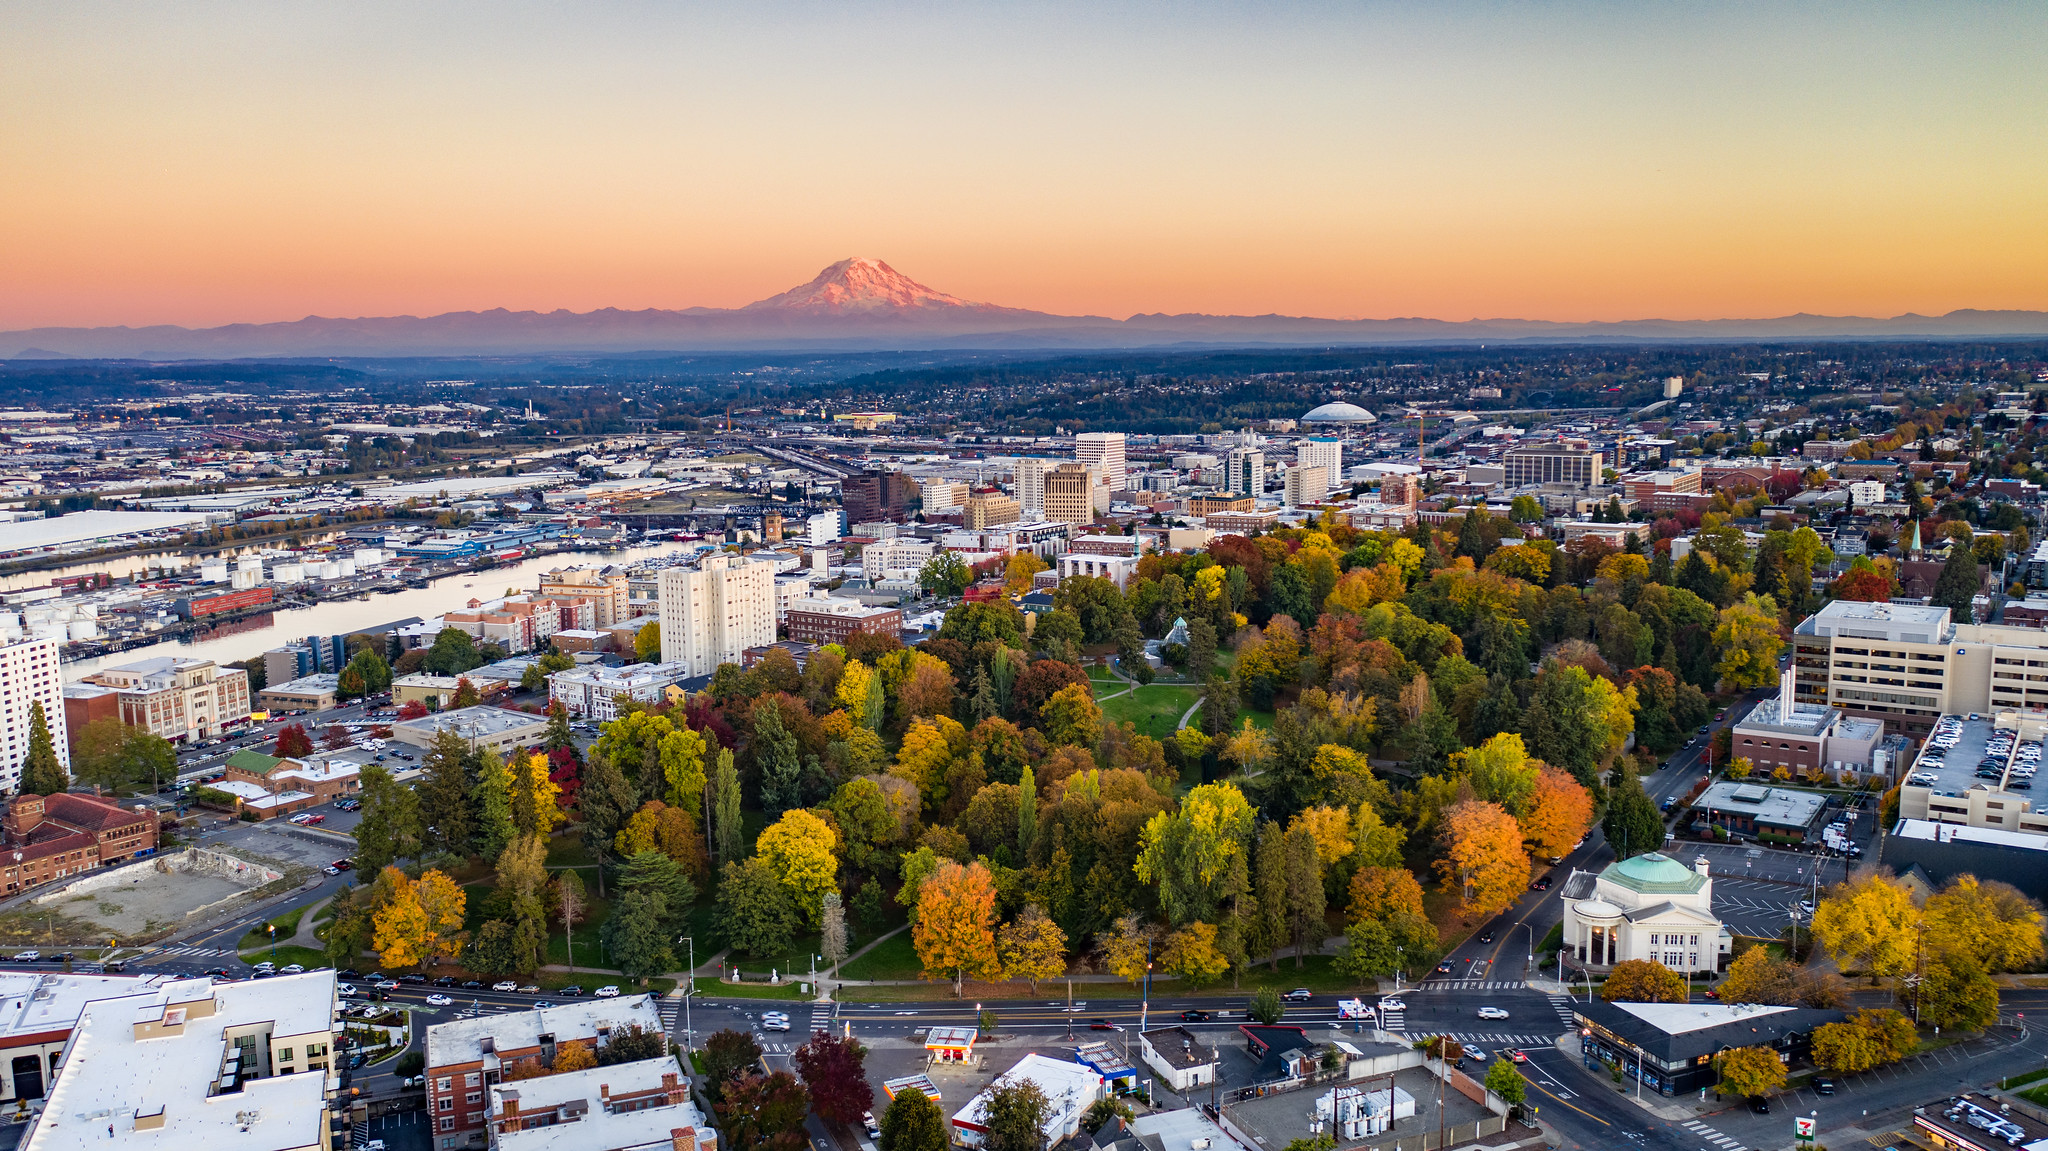 Drone Shot of Tacoma looking towards Mt. Rainier